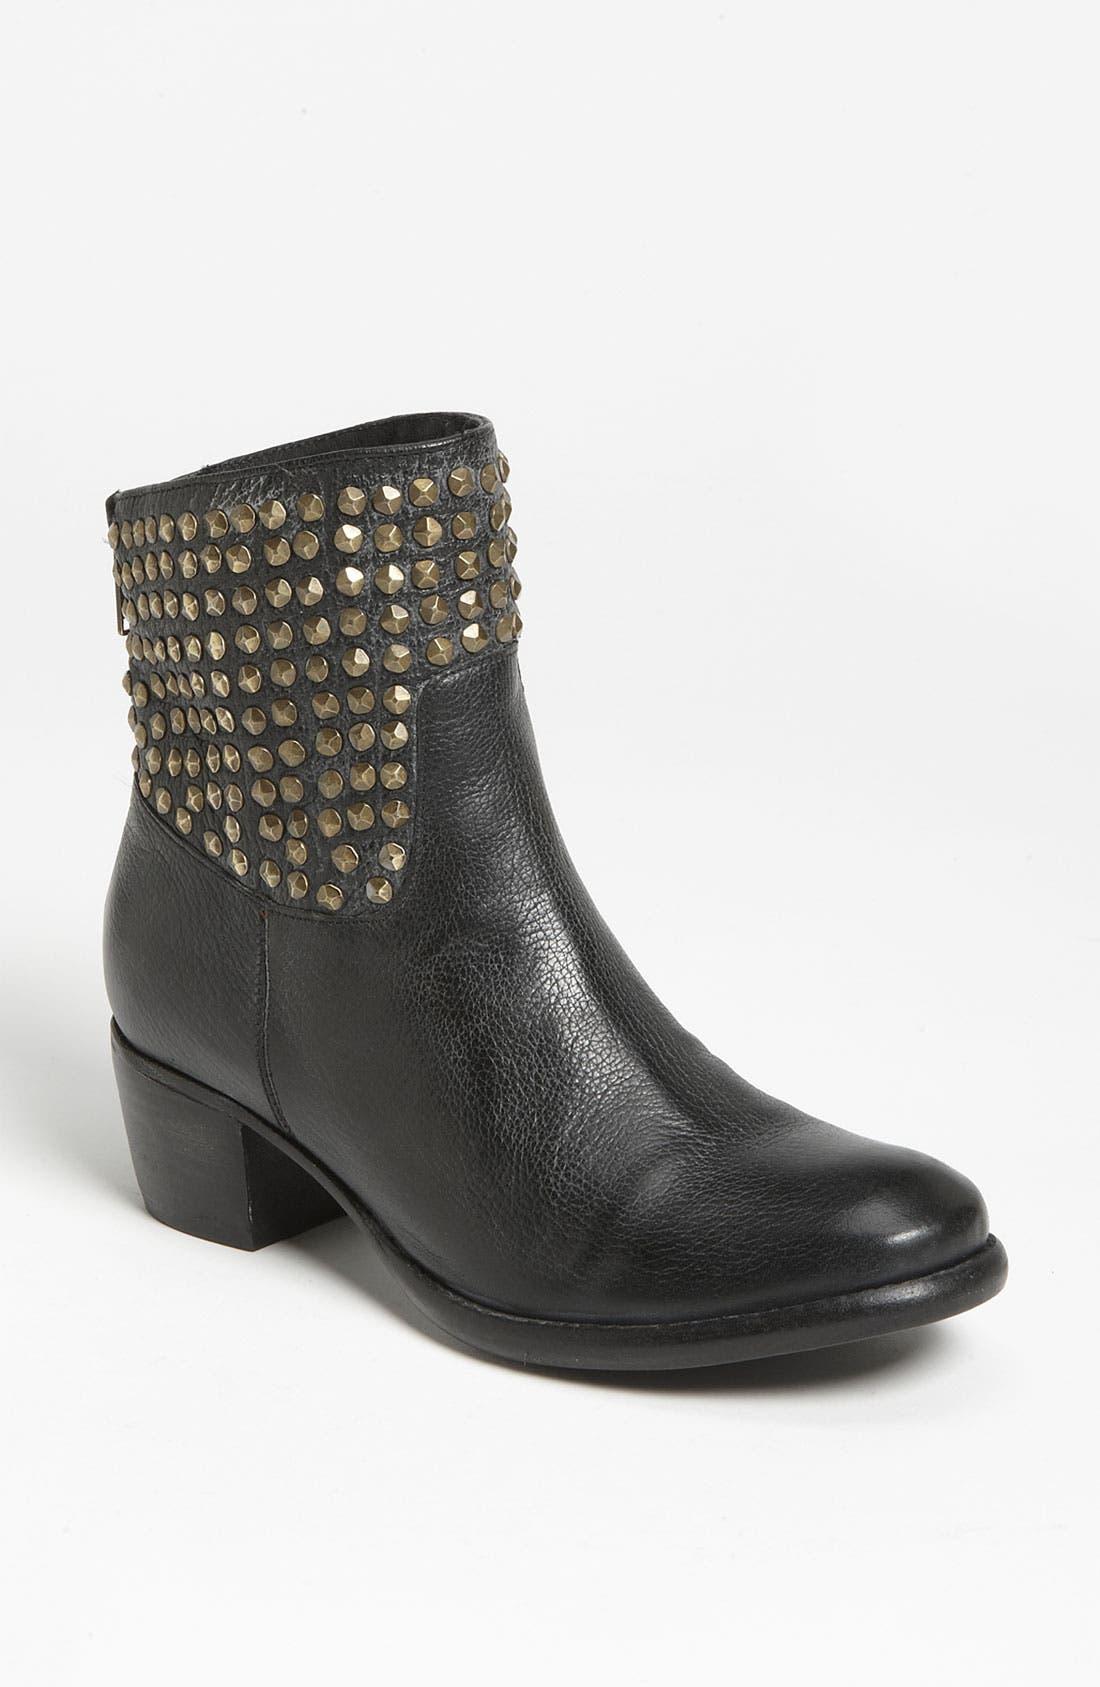 Alternate Image 1 Selected - Dolce Vita 'Mella' Boot